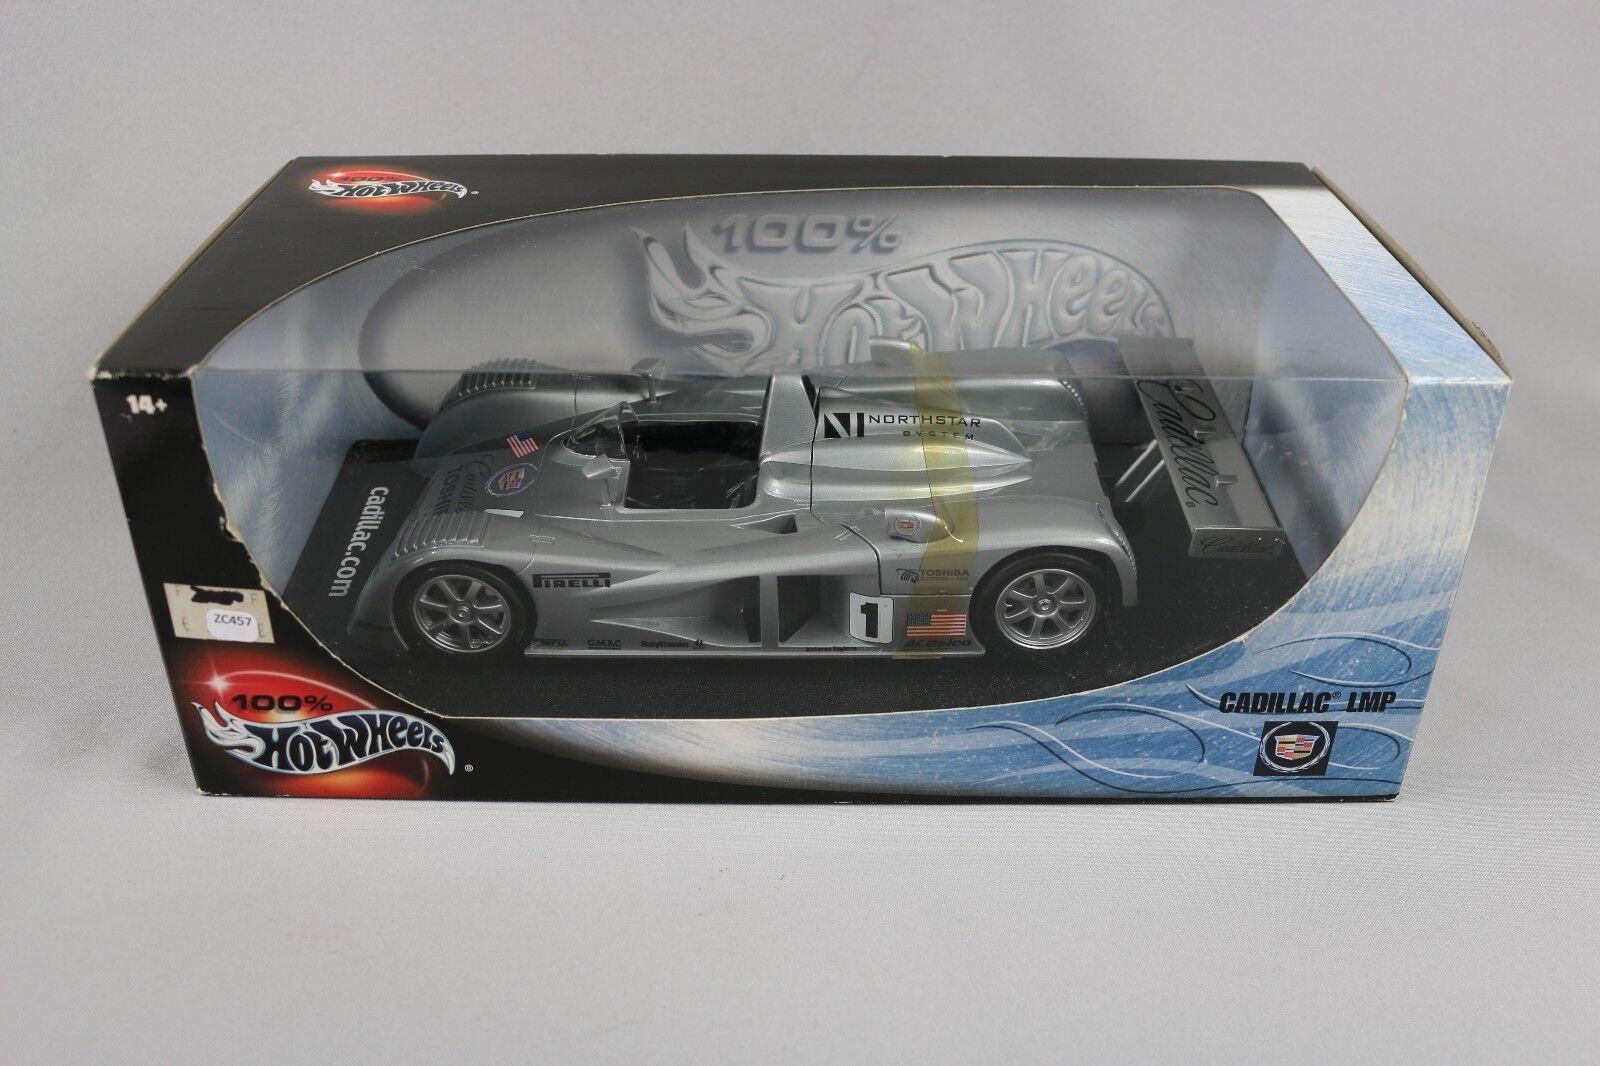 ZC457 Mattel Hot Wheels 29225 Miniature Voiture 1 18 Cadillac LMP 2000